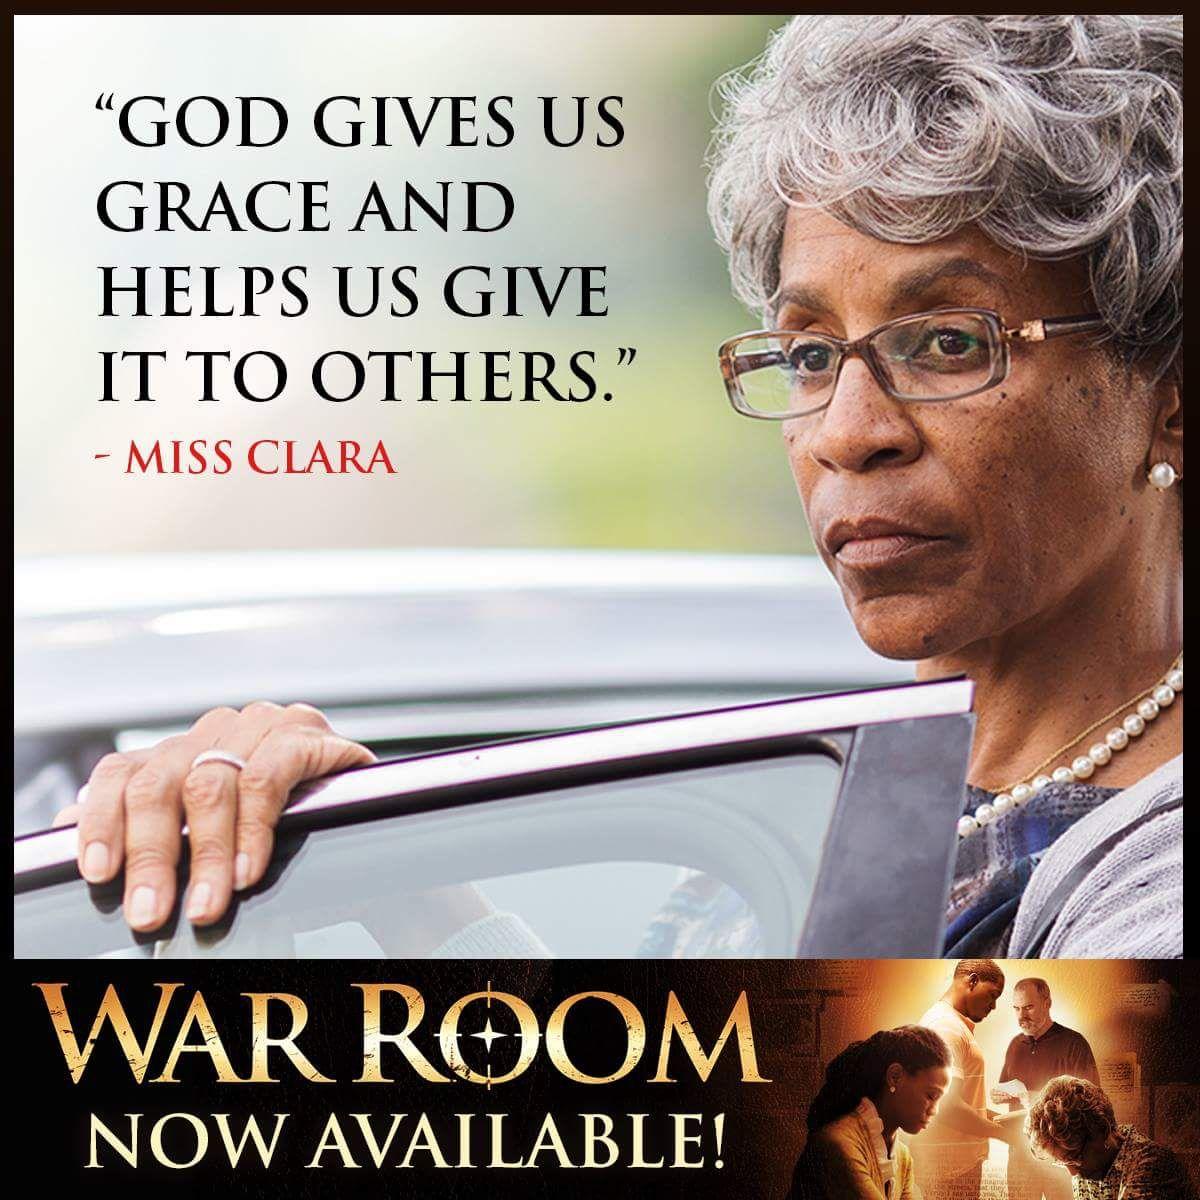 War room | ME | Prayer room, Prayer closet, Christian